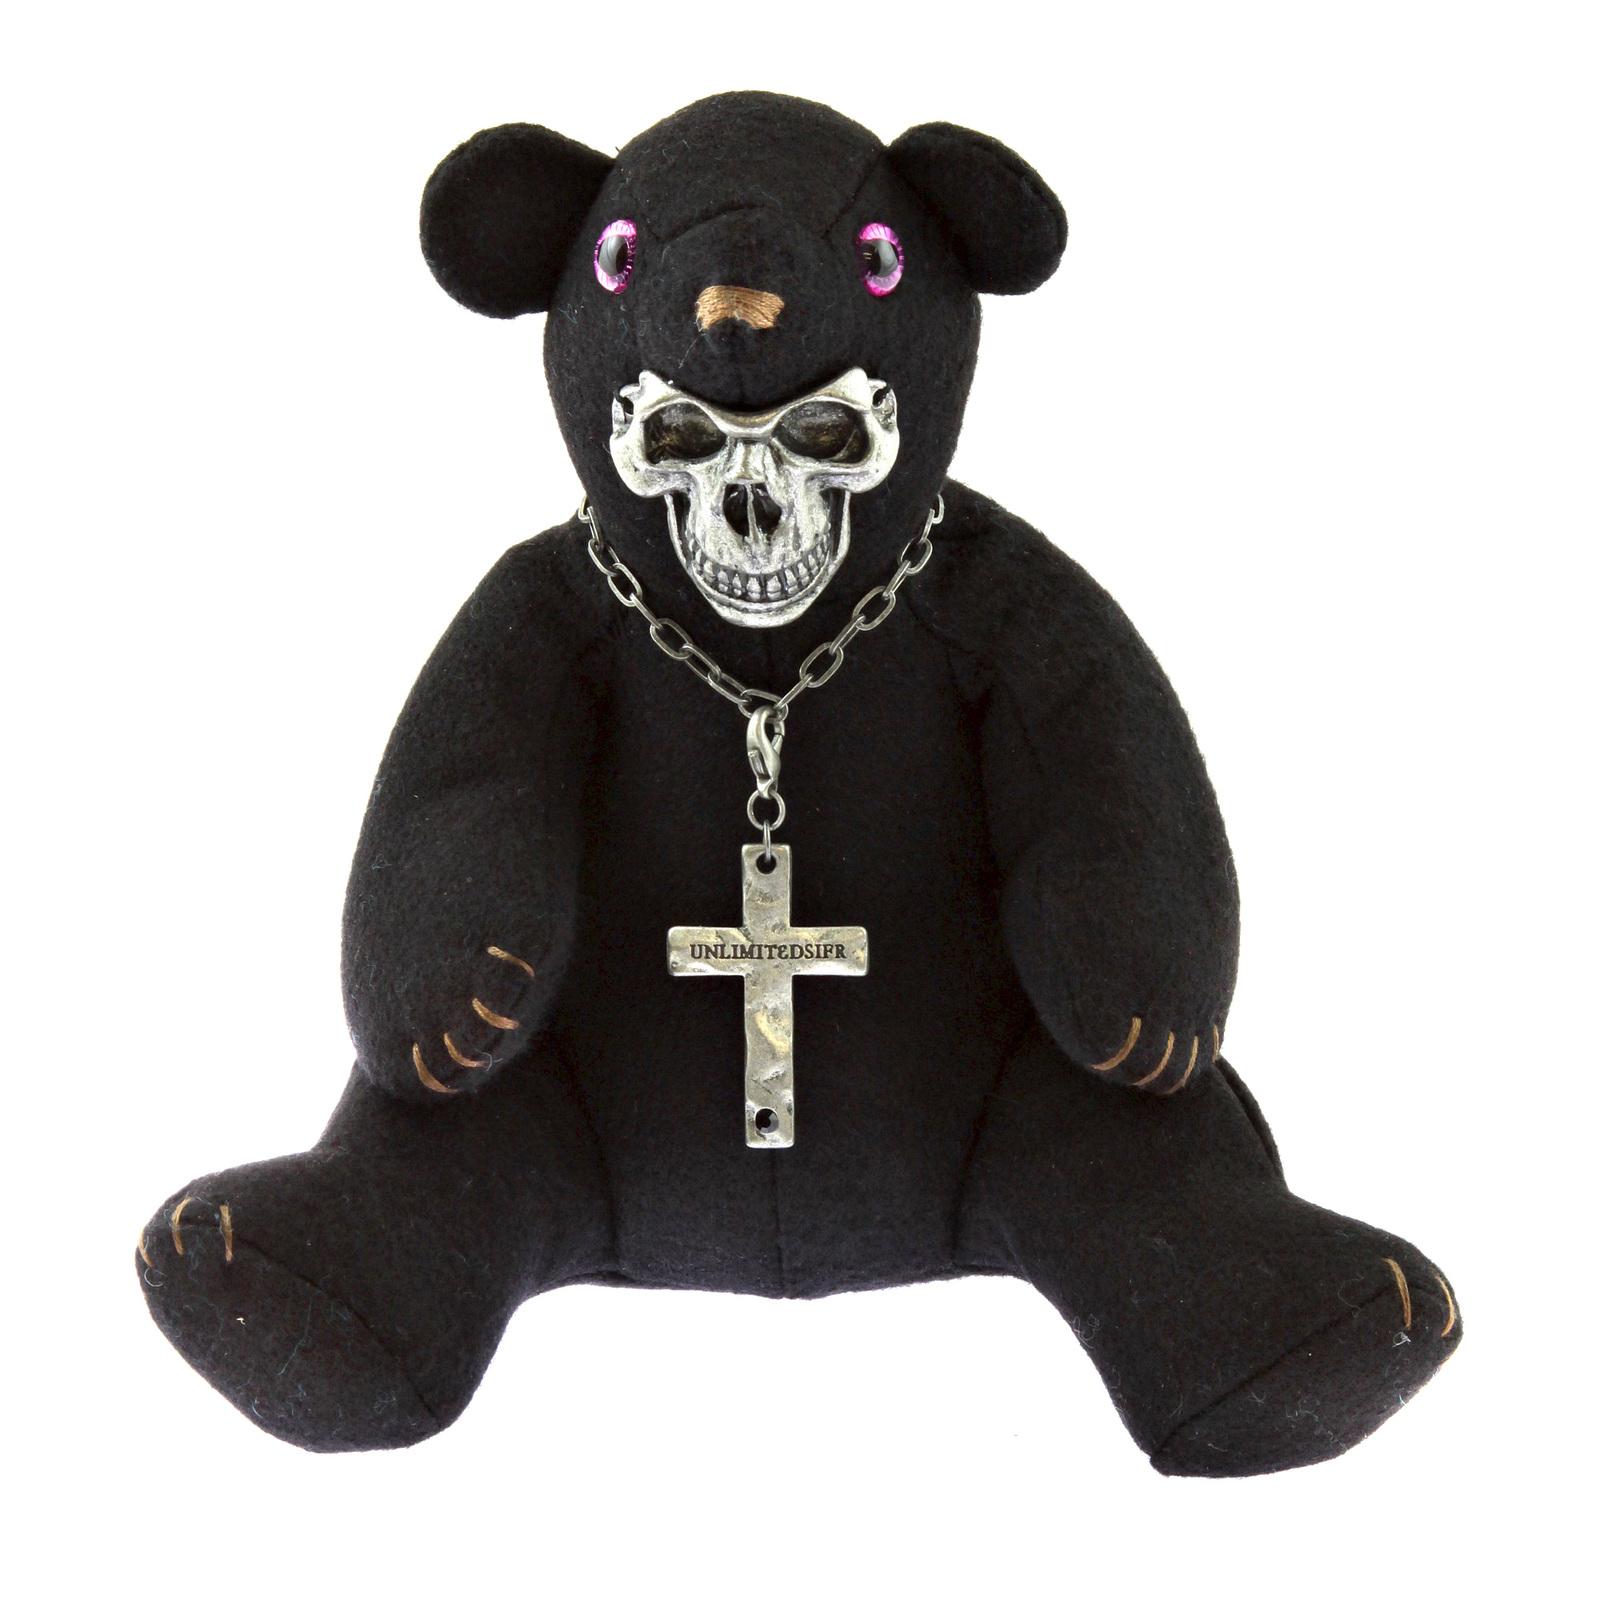 Teddy Bear Skull Drawing Yoropiko x Unlimitedsifr Bear